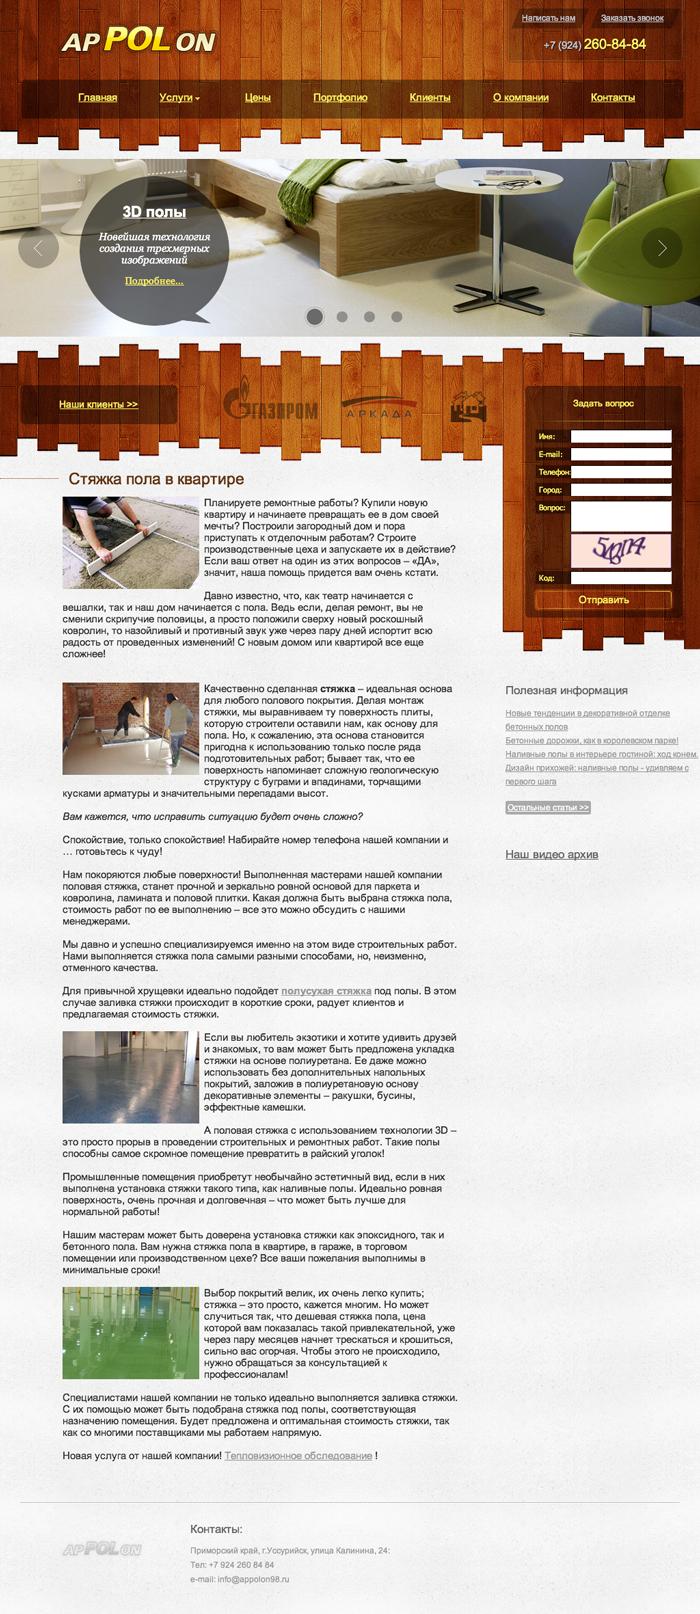 appolon98.ru